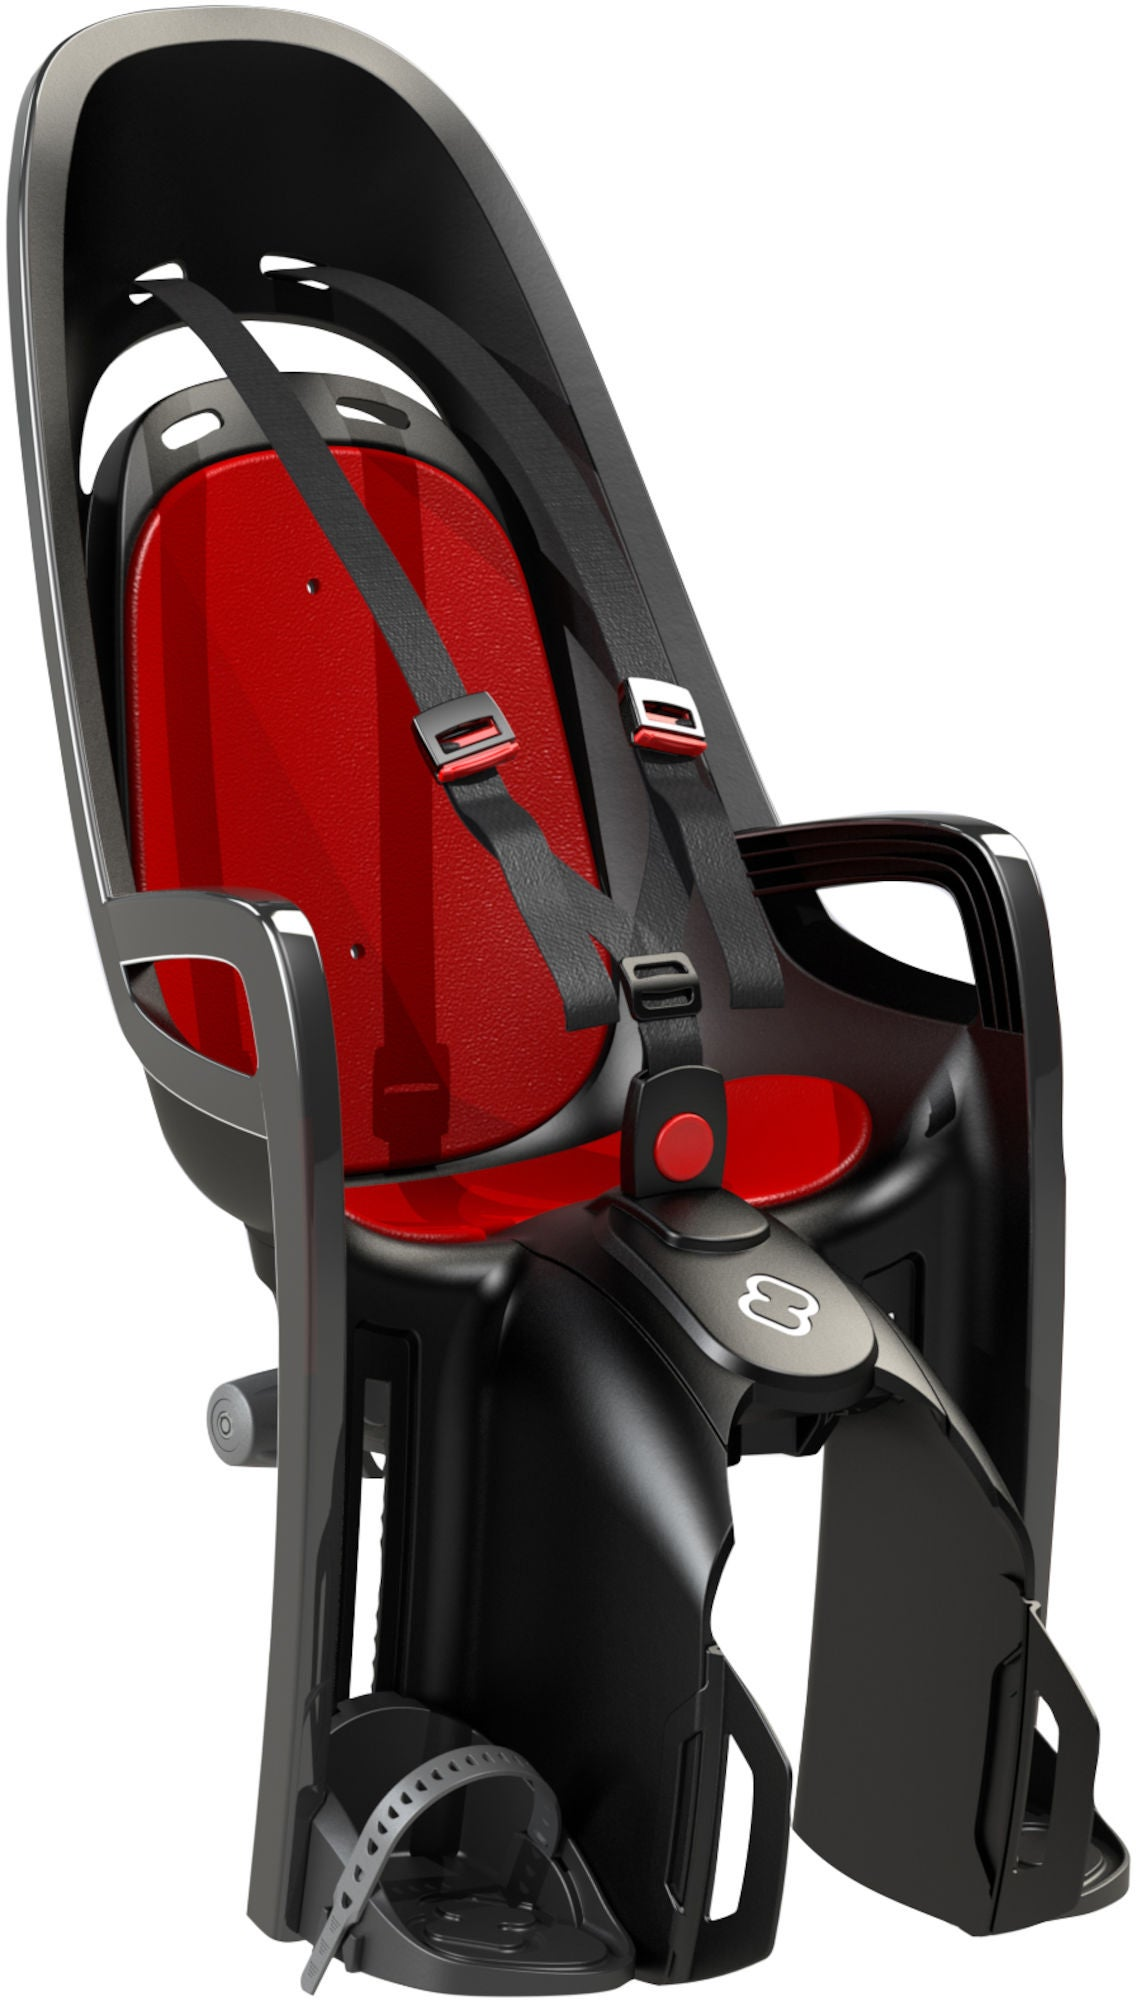 Hamax Zenith Cykelstol inkl. Bagagebærer-adapter, Grå/Rød | Bike seat